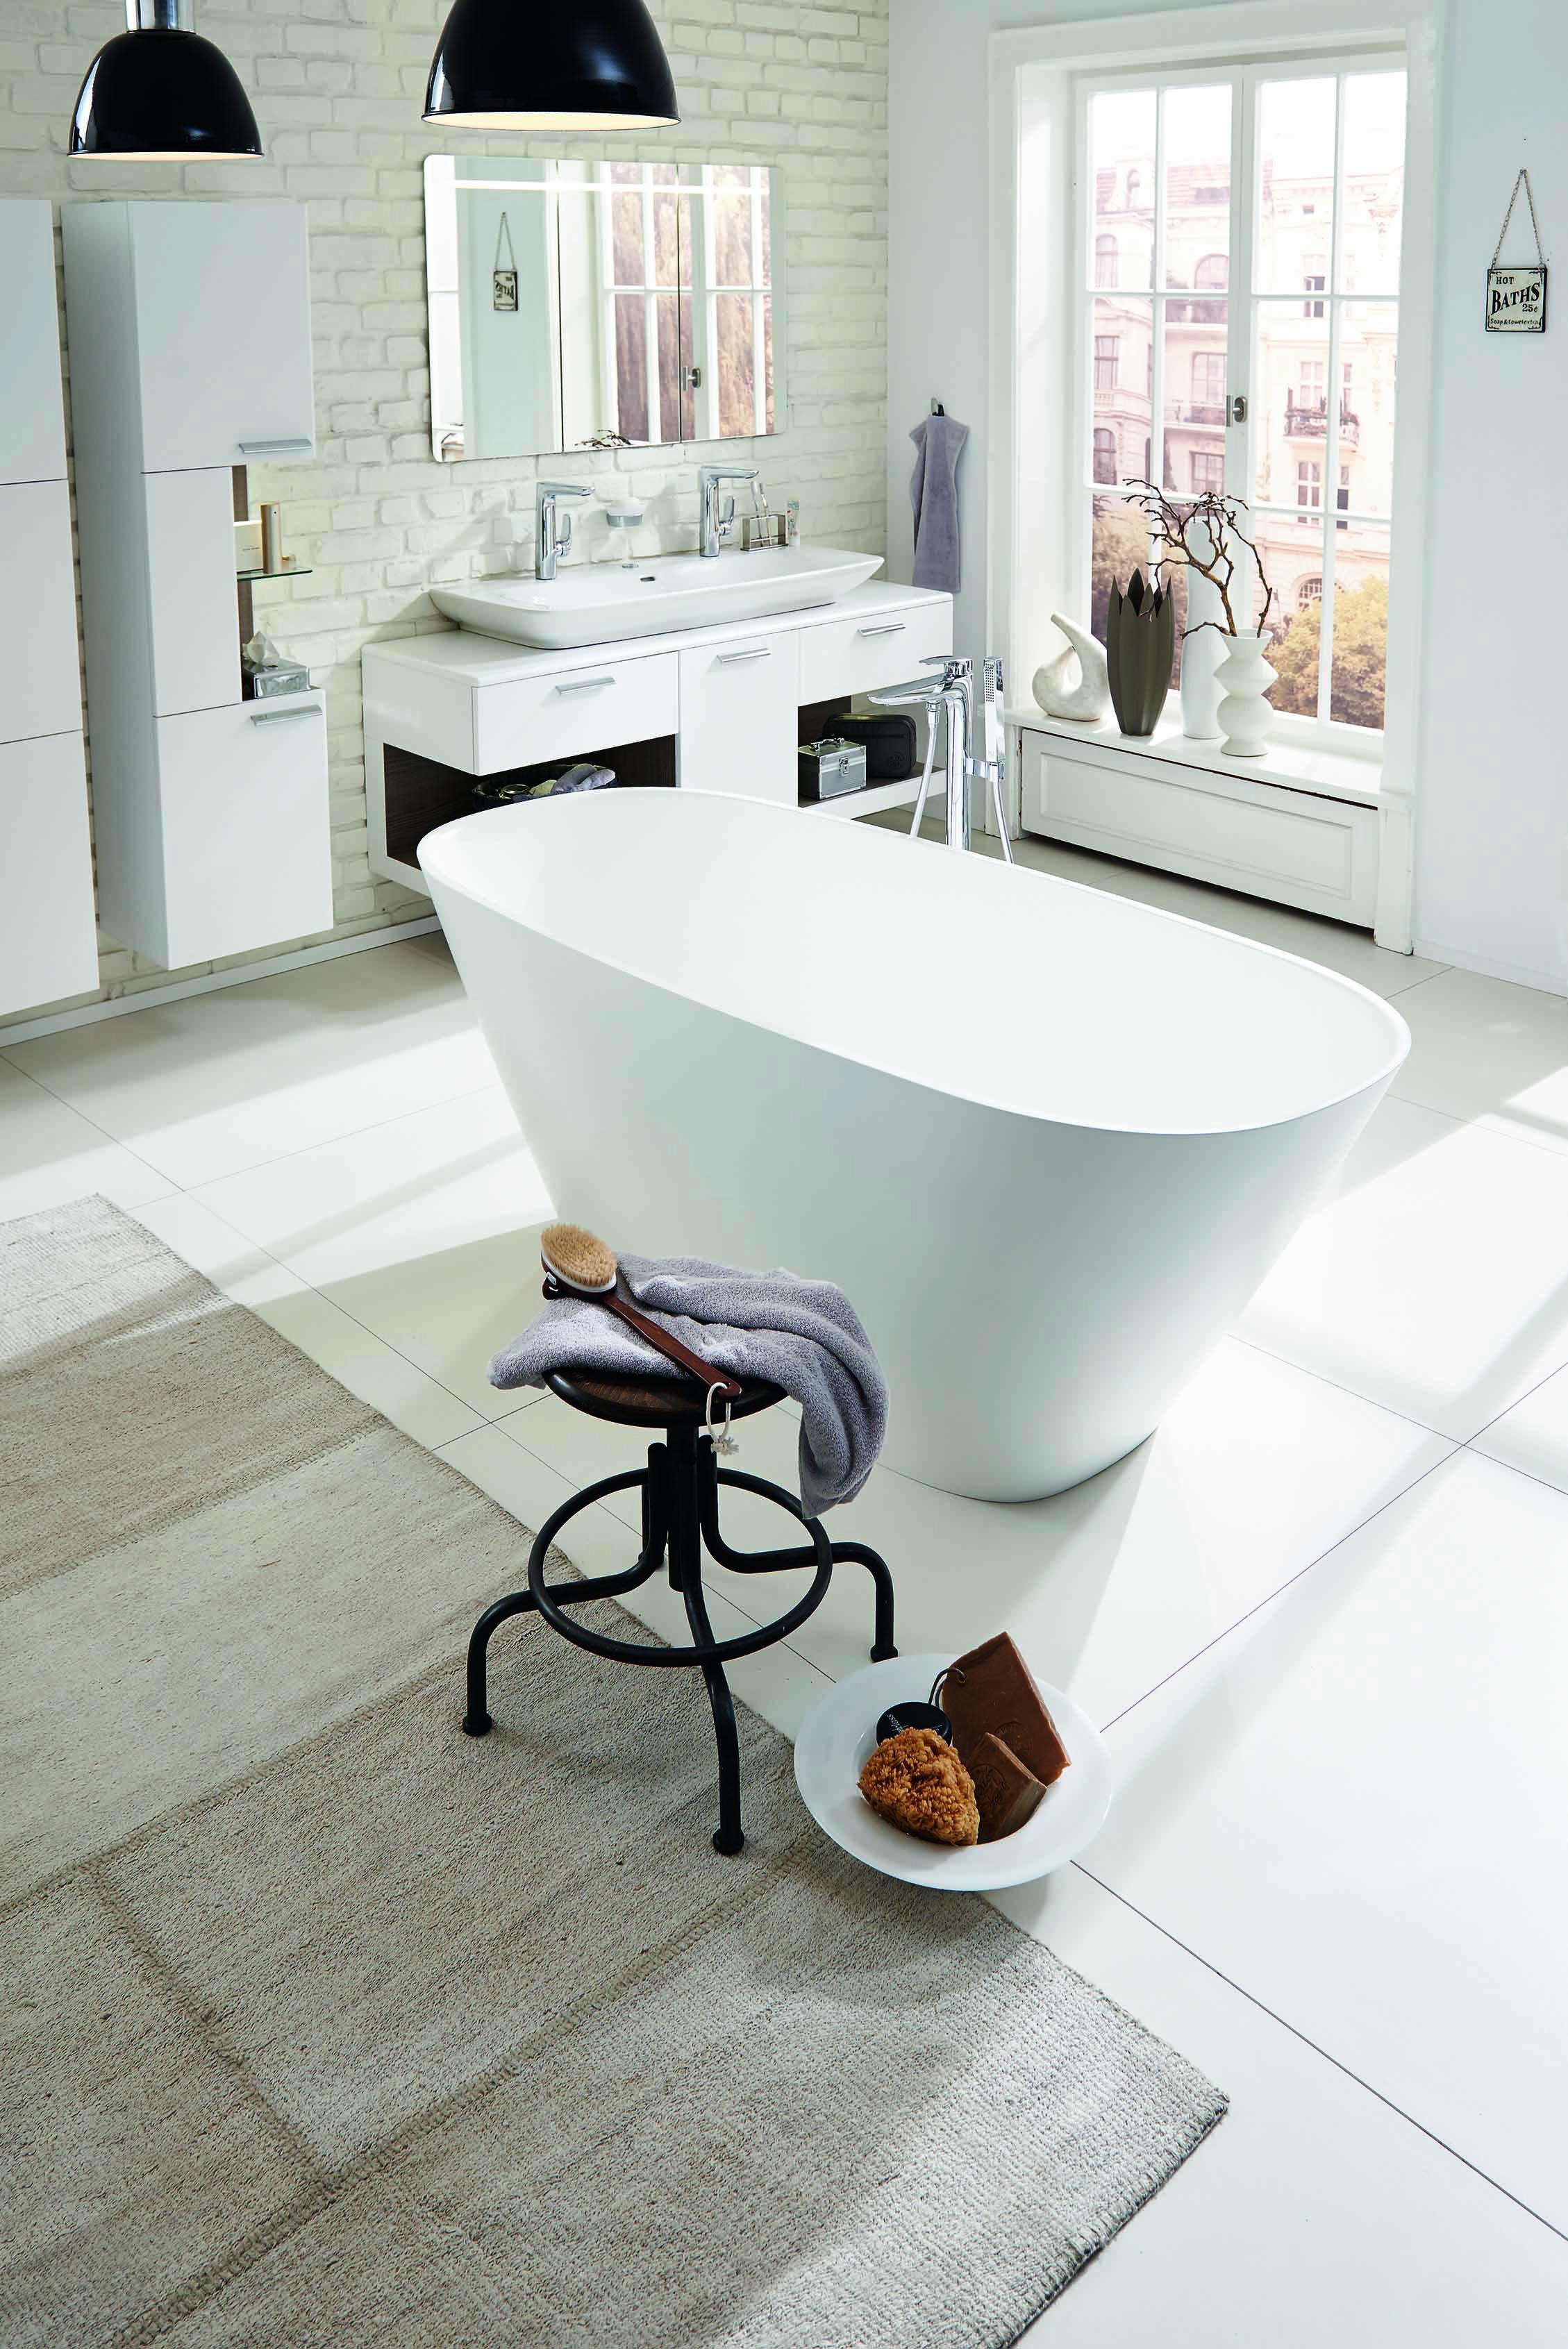 Vigour white Bad | Komplettbäder | Pinterest | Bathroom inspiration